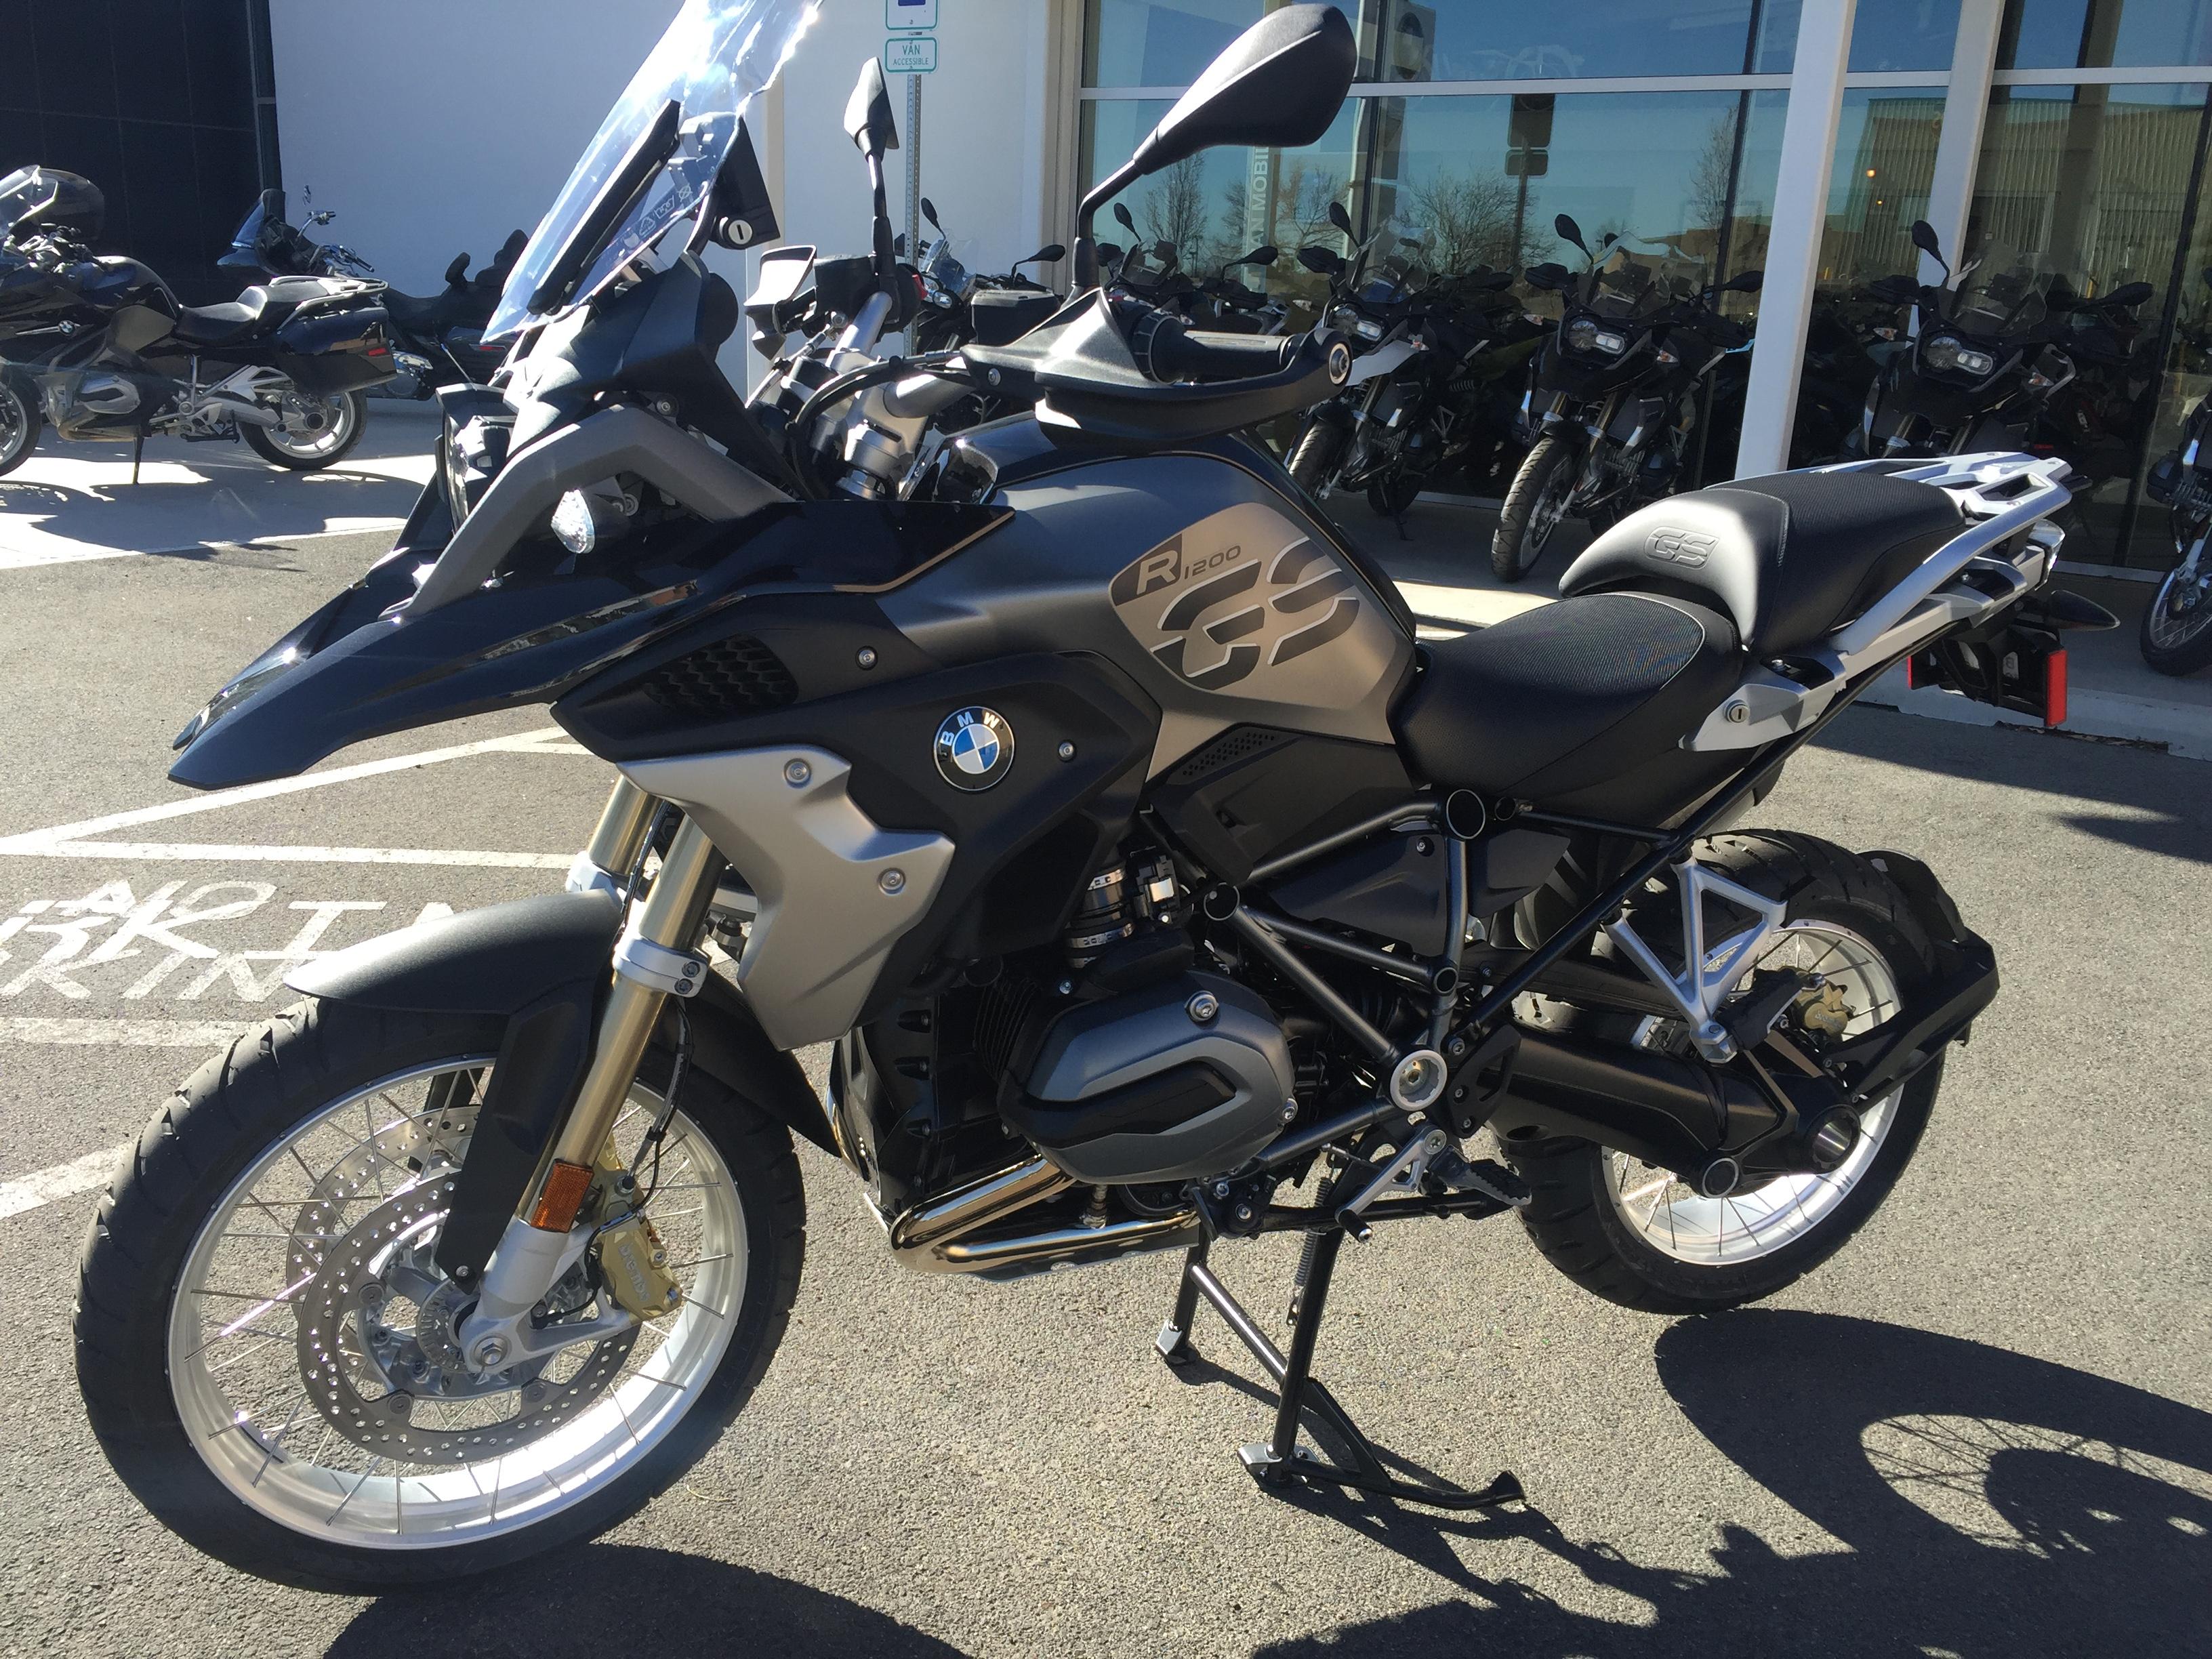 New BMW Motorcycles - R1200GS   Santa Fe BMW Motorcycles   Santa Fe, NM